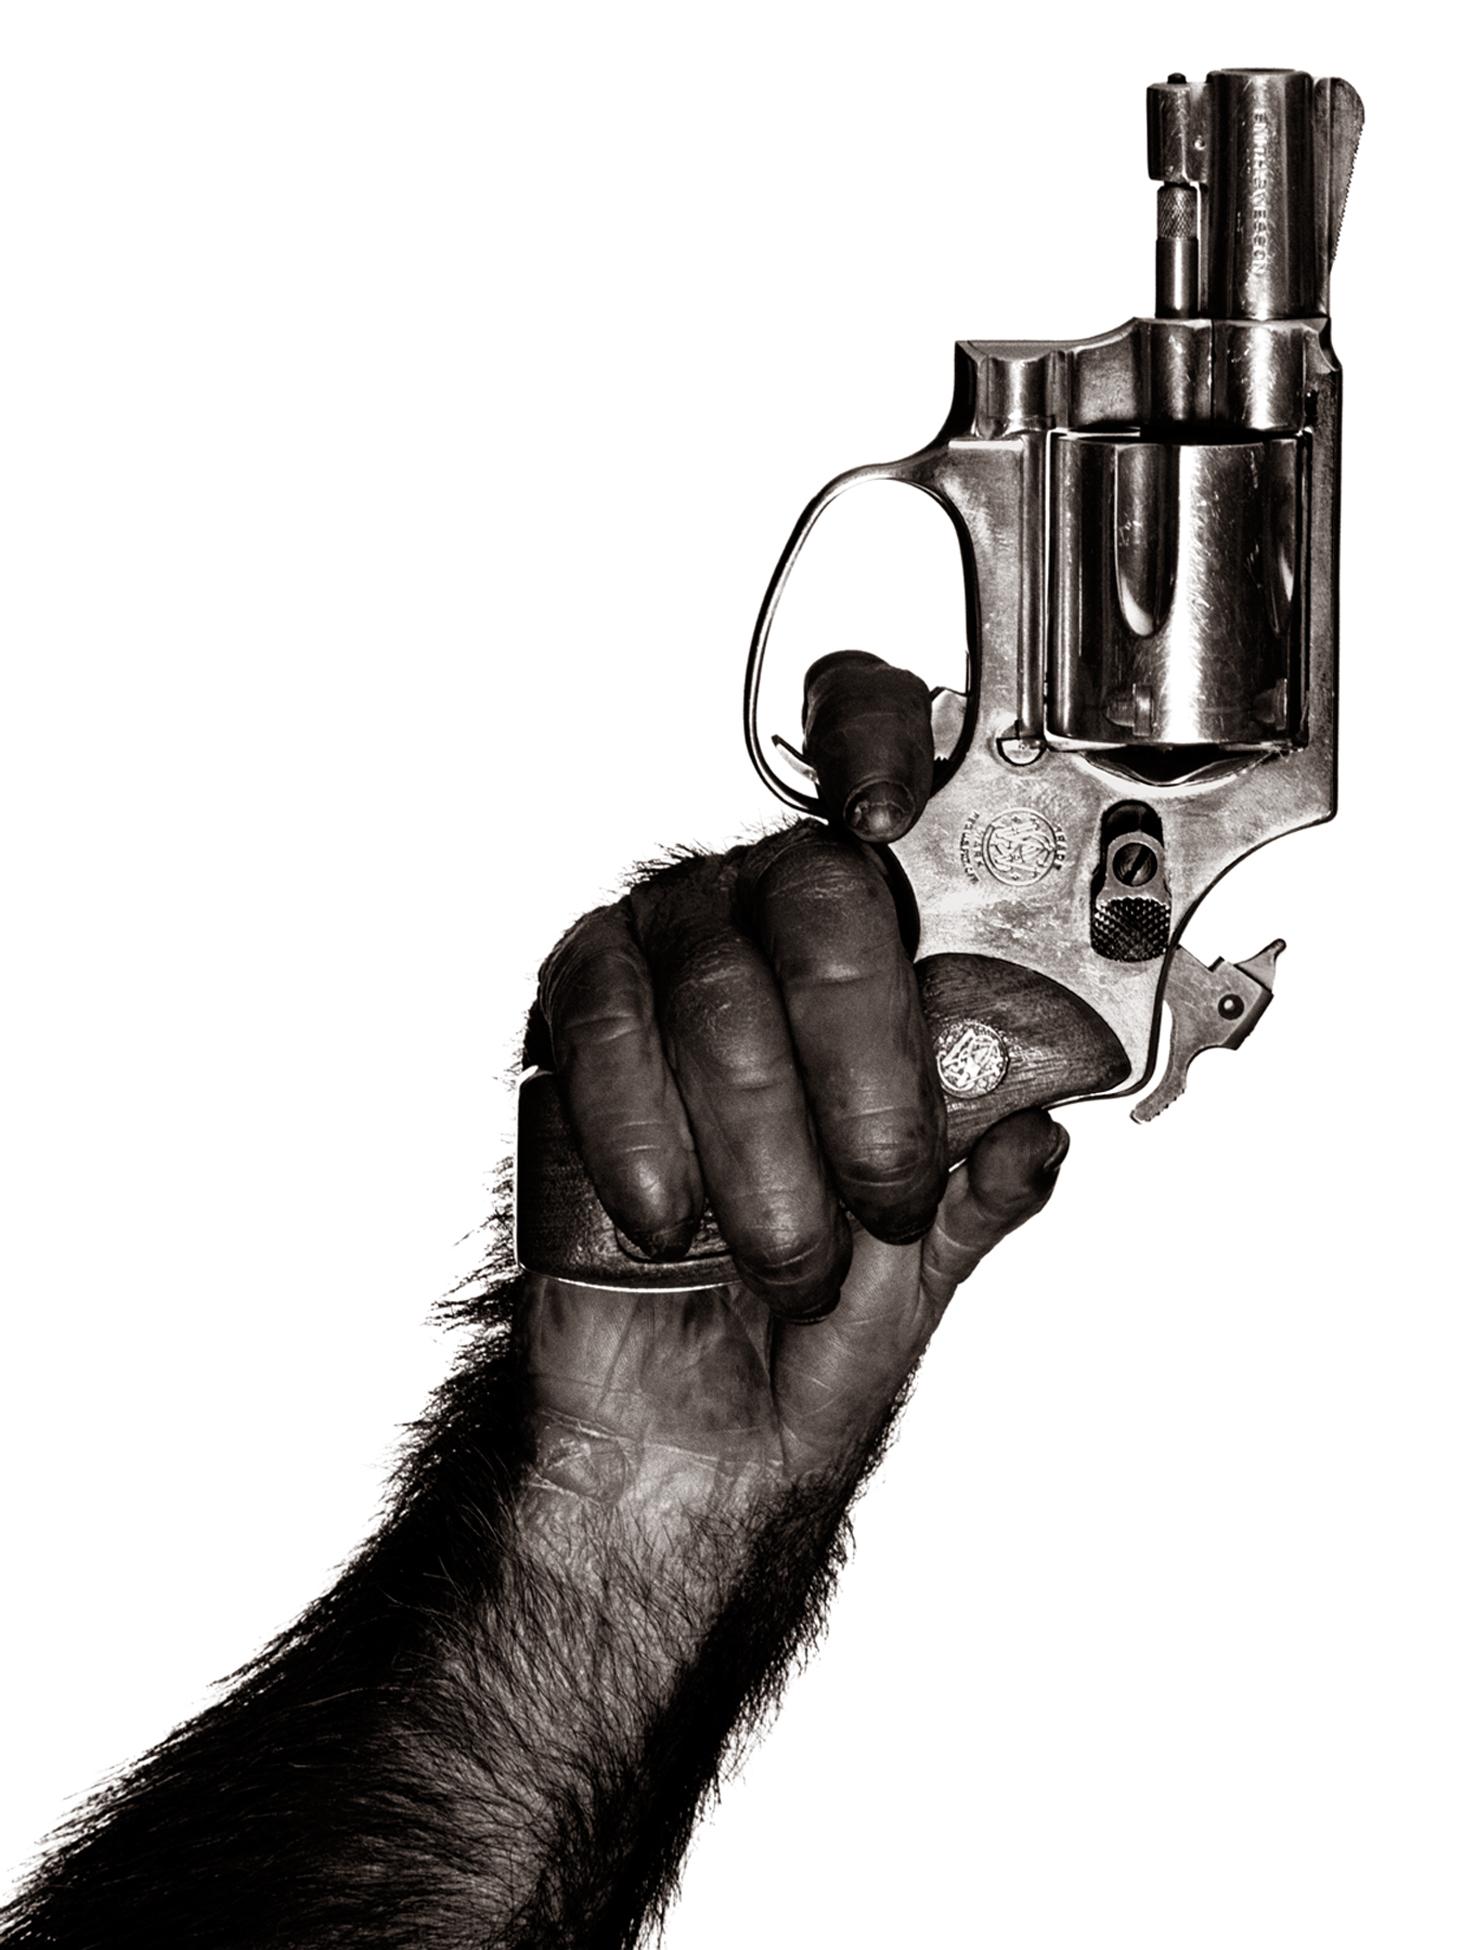 albert watson monkey with gun.jpg